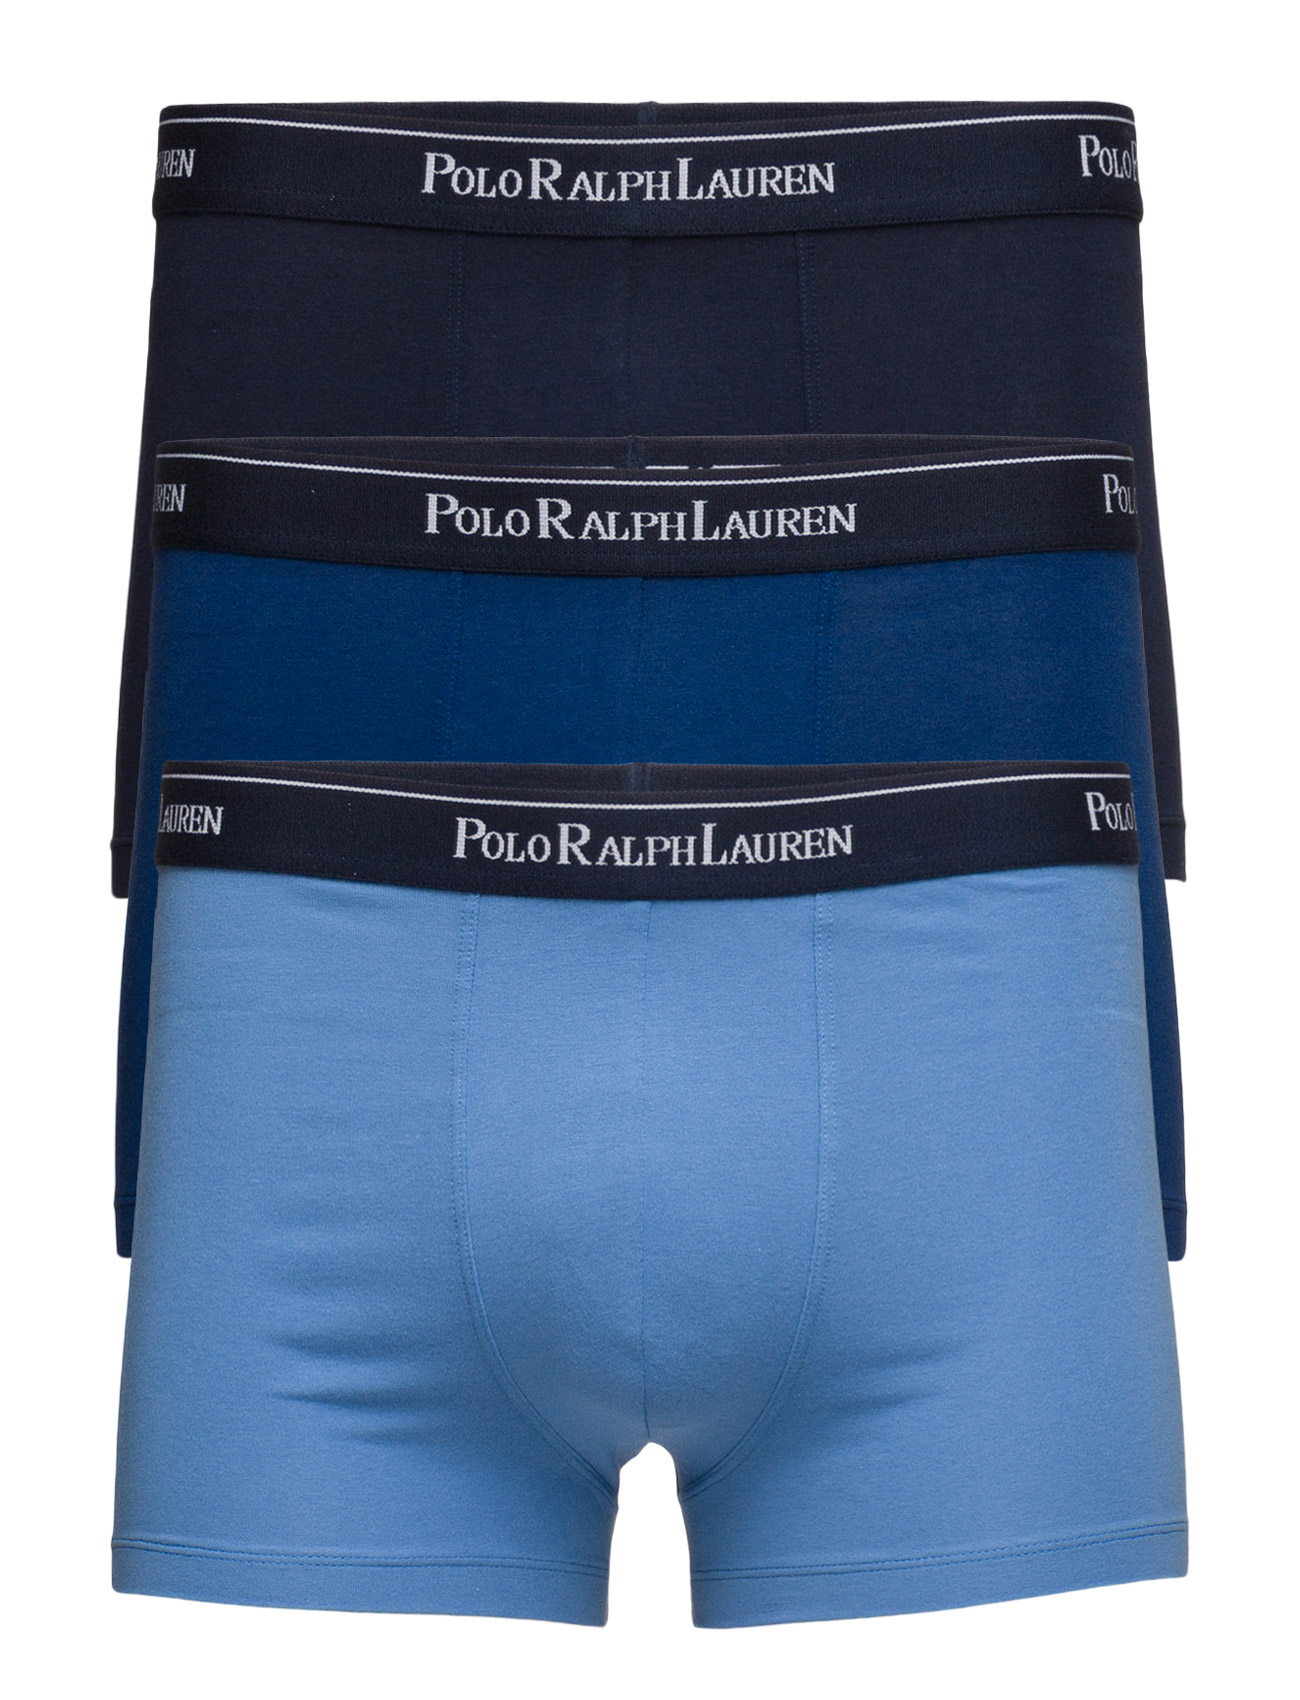 Pánské boxerky Three classic trunks 3pack - Ralph Lauren - Modrá mix/M